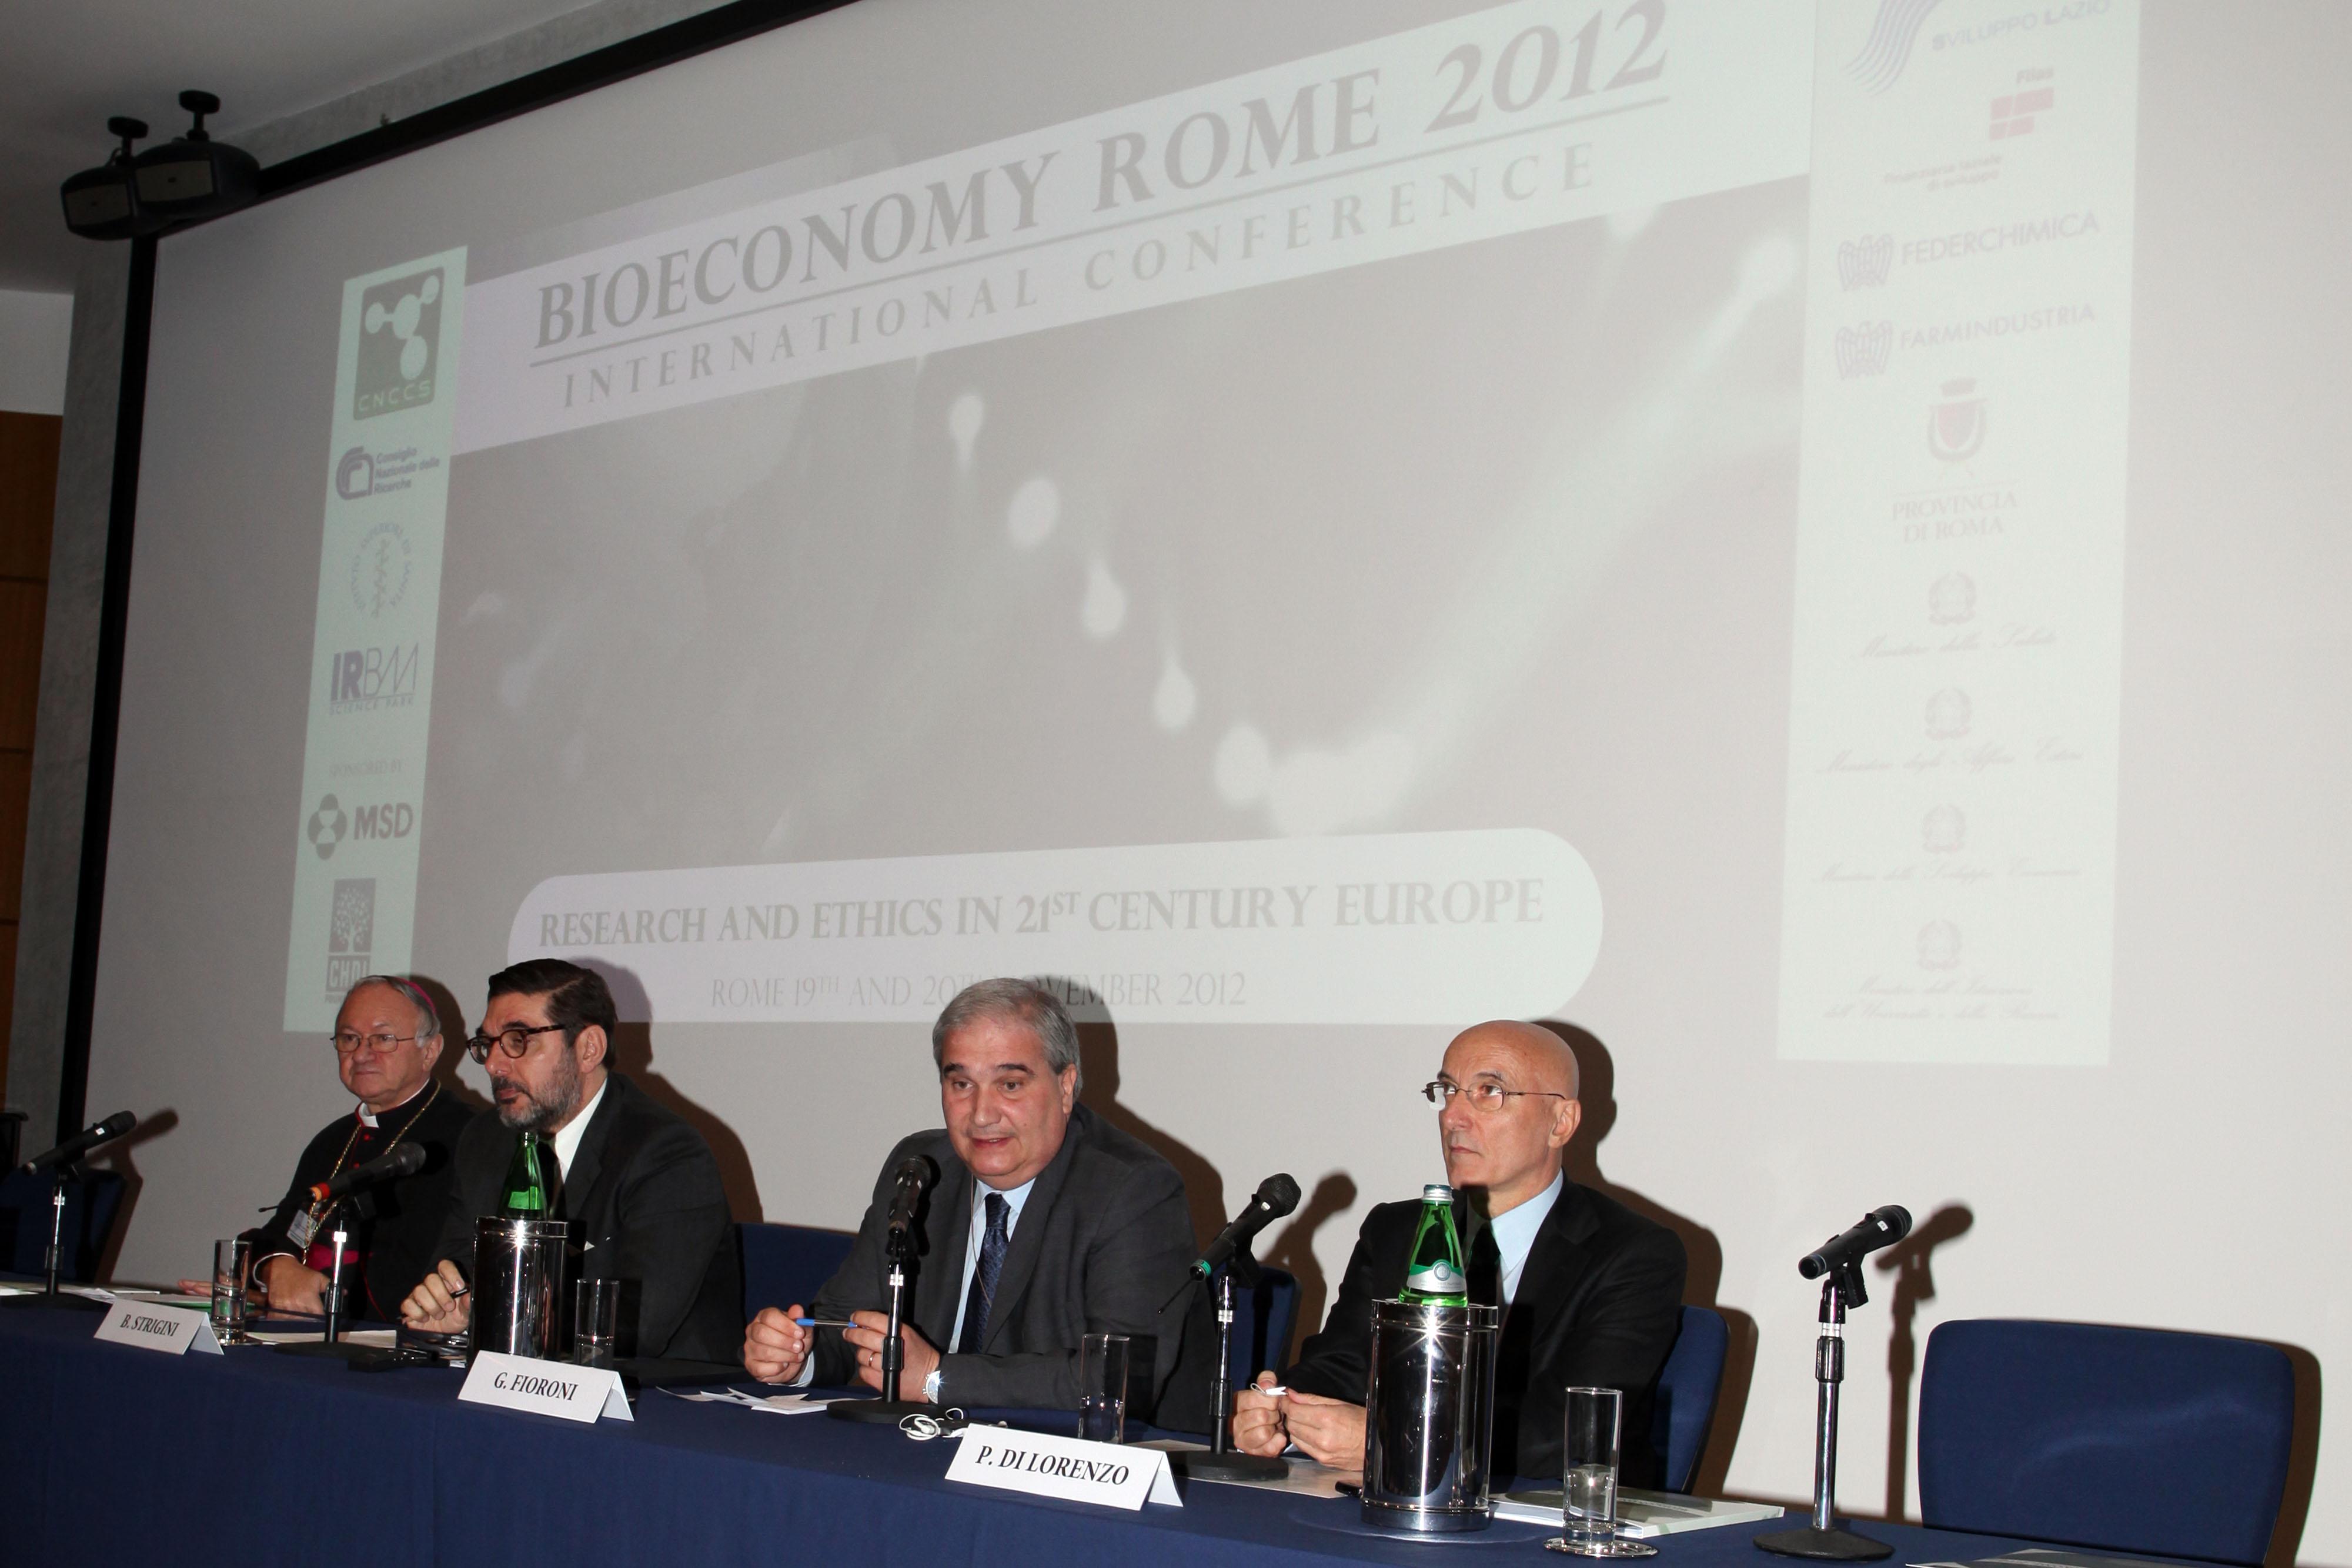 Piero Di Lorenzo Bioeconomy Rome